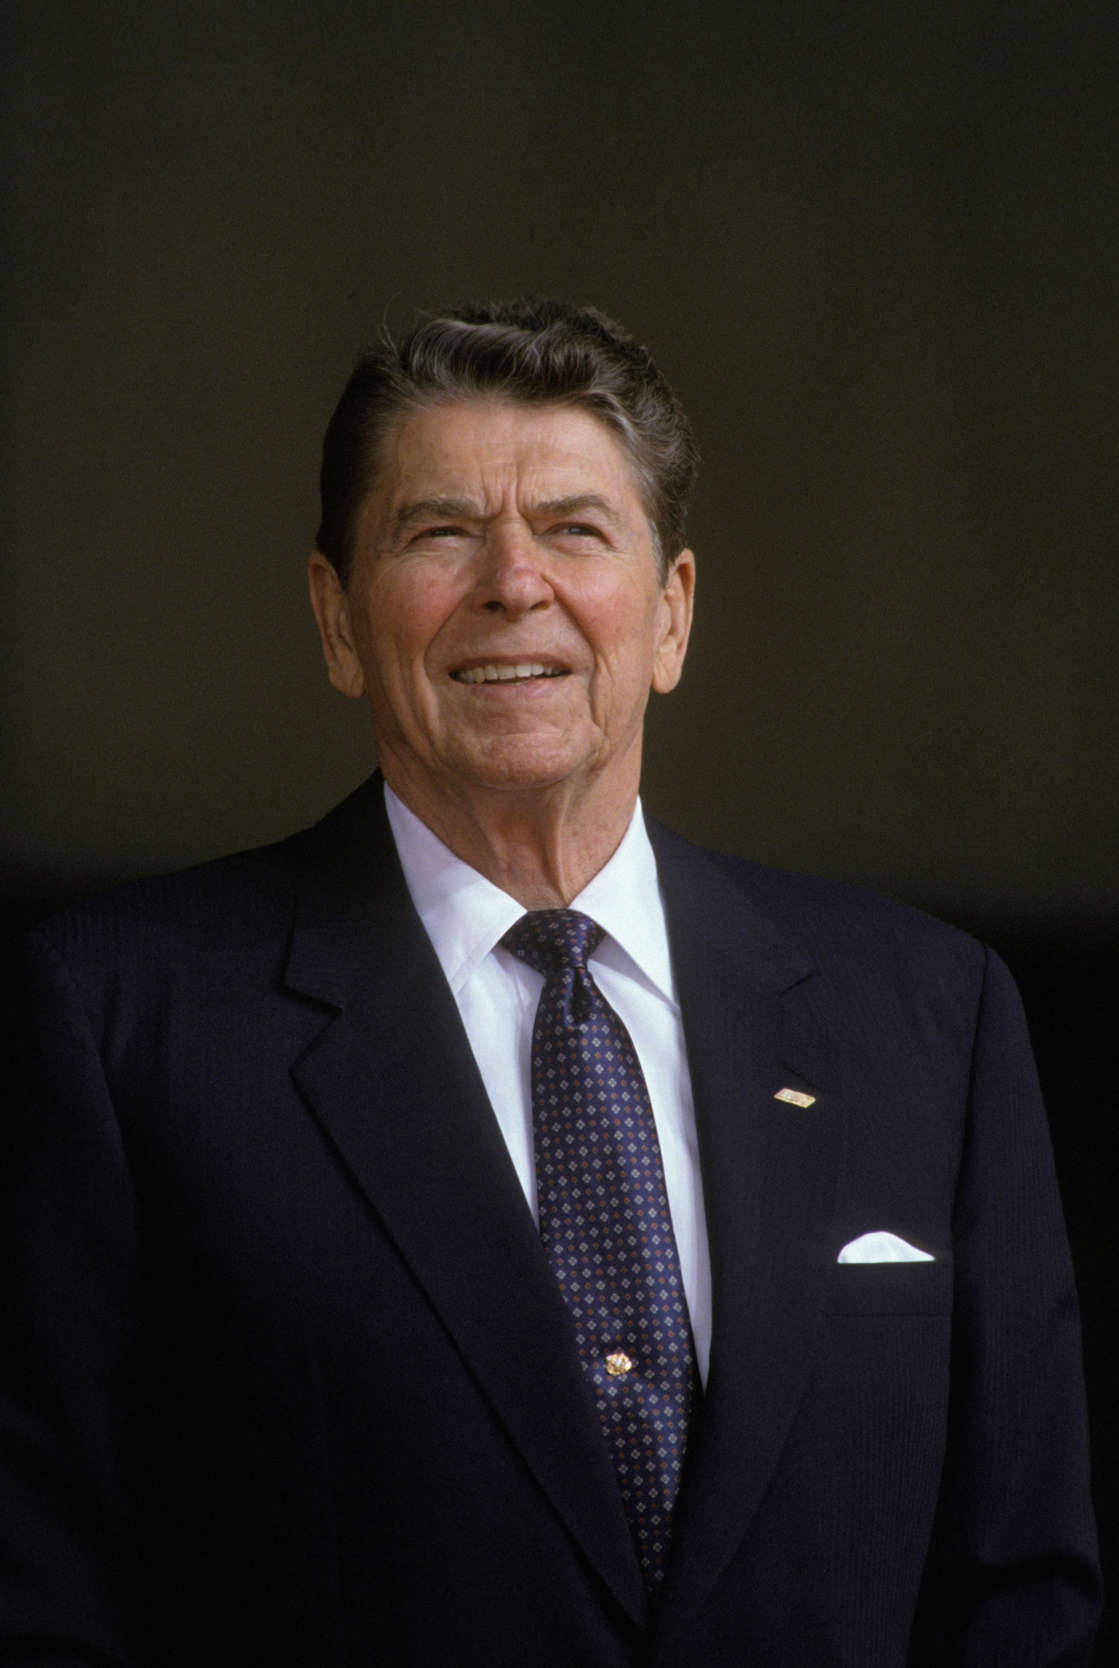 Ronald Reagan au sommet des pays industrialises le 19 juin 1988 a Toronto, Canada. (Photo by Alexis DUCLOS/Gamma-Rapho via Getty Images)